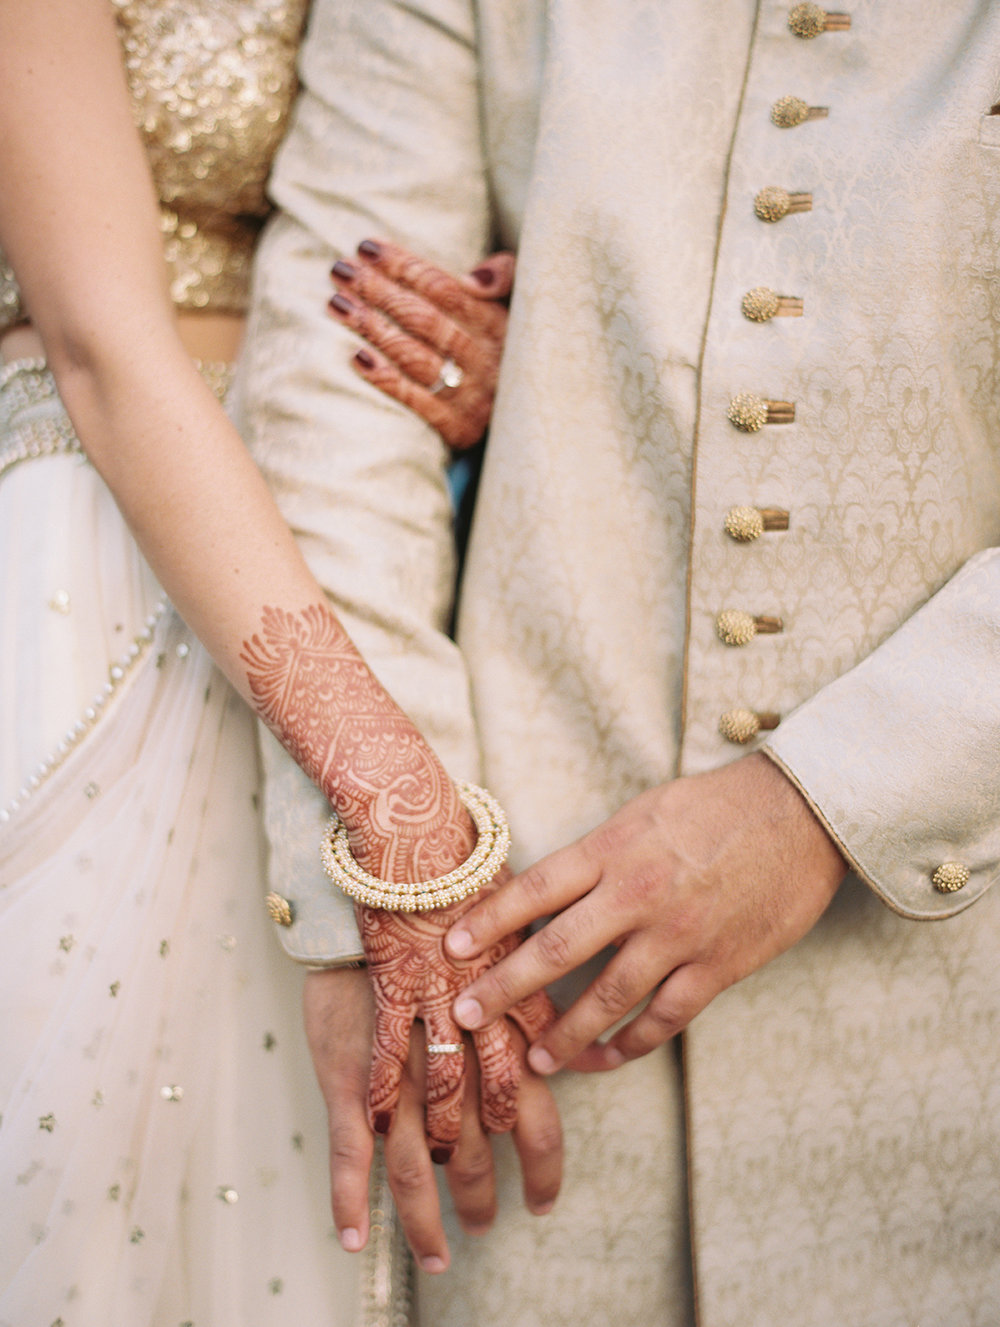 115-fine-art-film-photography-india-engagement-david-ali-brumley-wells.jpg